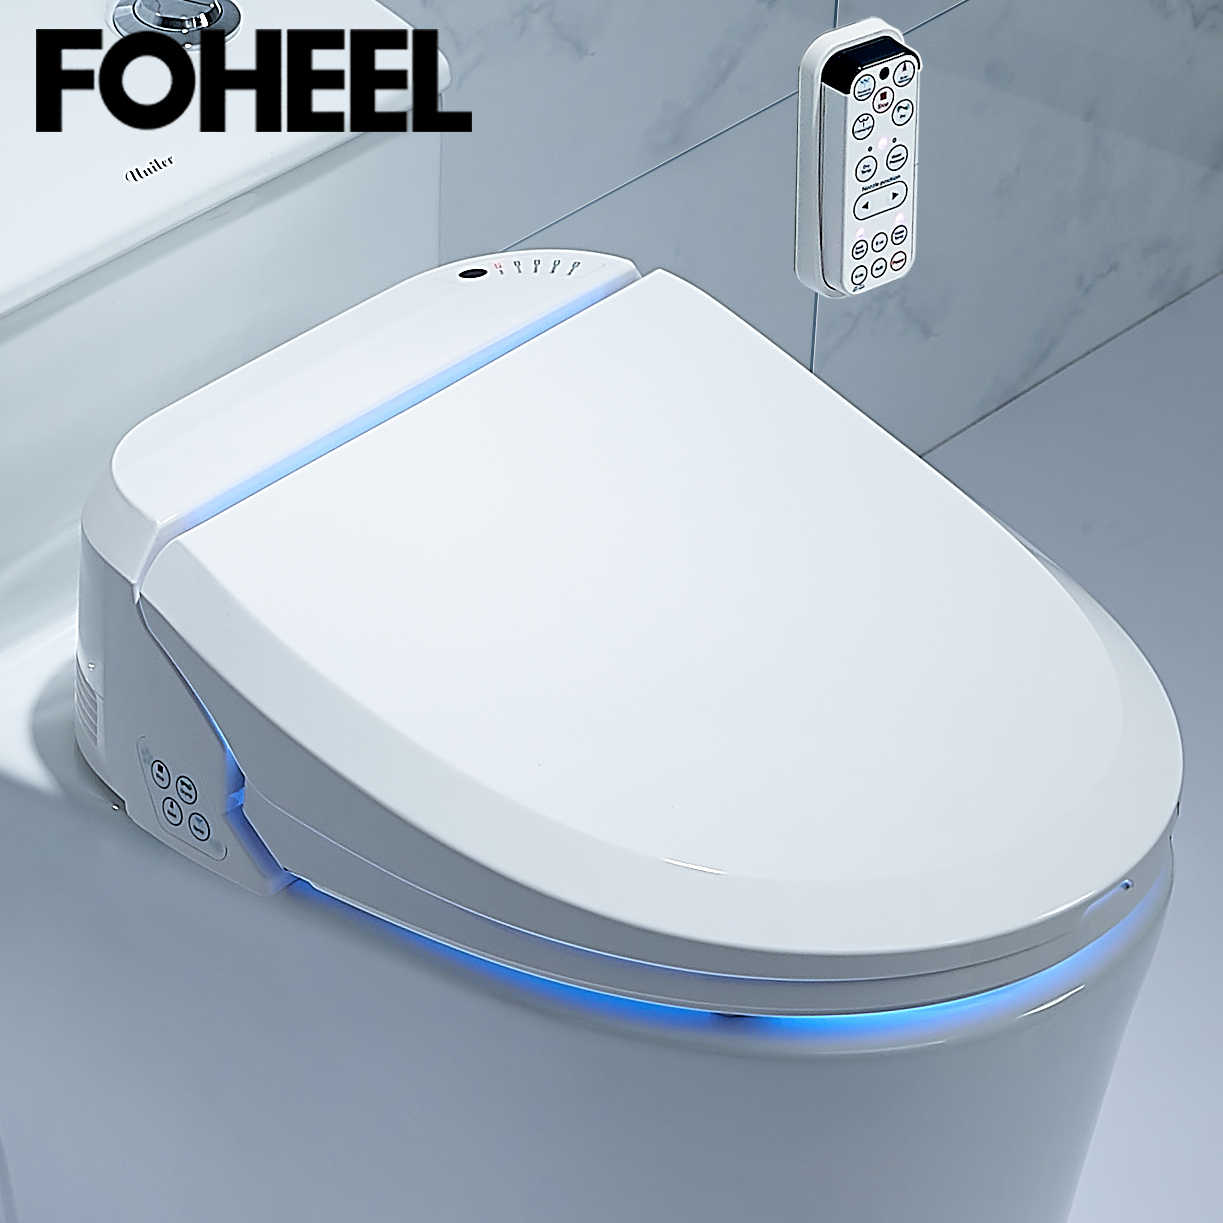 Foheel Smart Toilet Kursi Listrik Kloset Duduk Cover Cerdas Kloset Duduk Panas Bersih Kering Pijat Cerdas Toilet Kursi